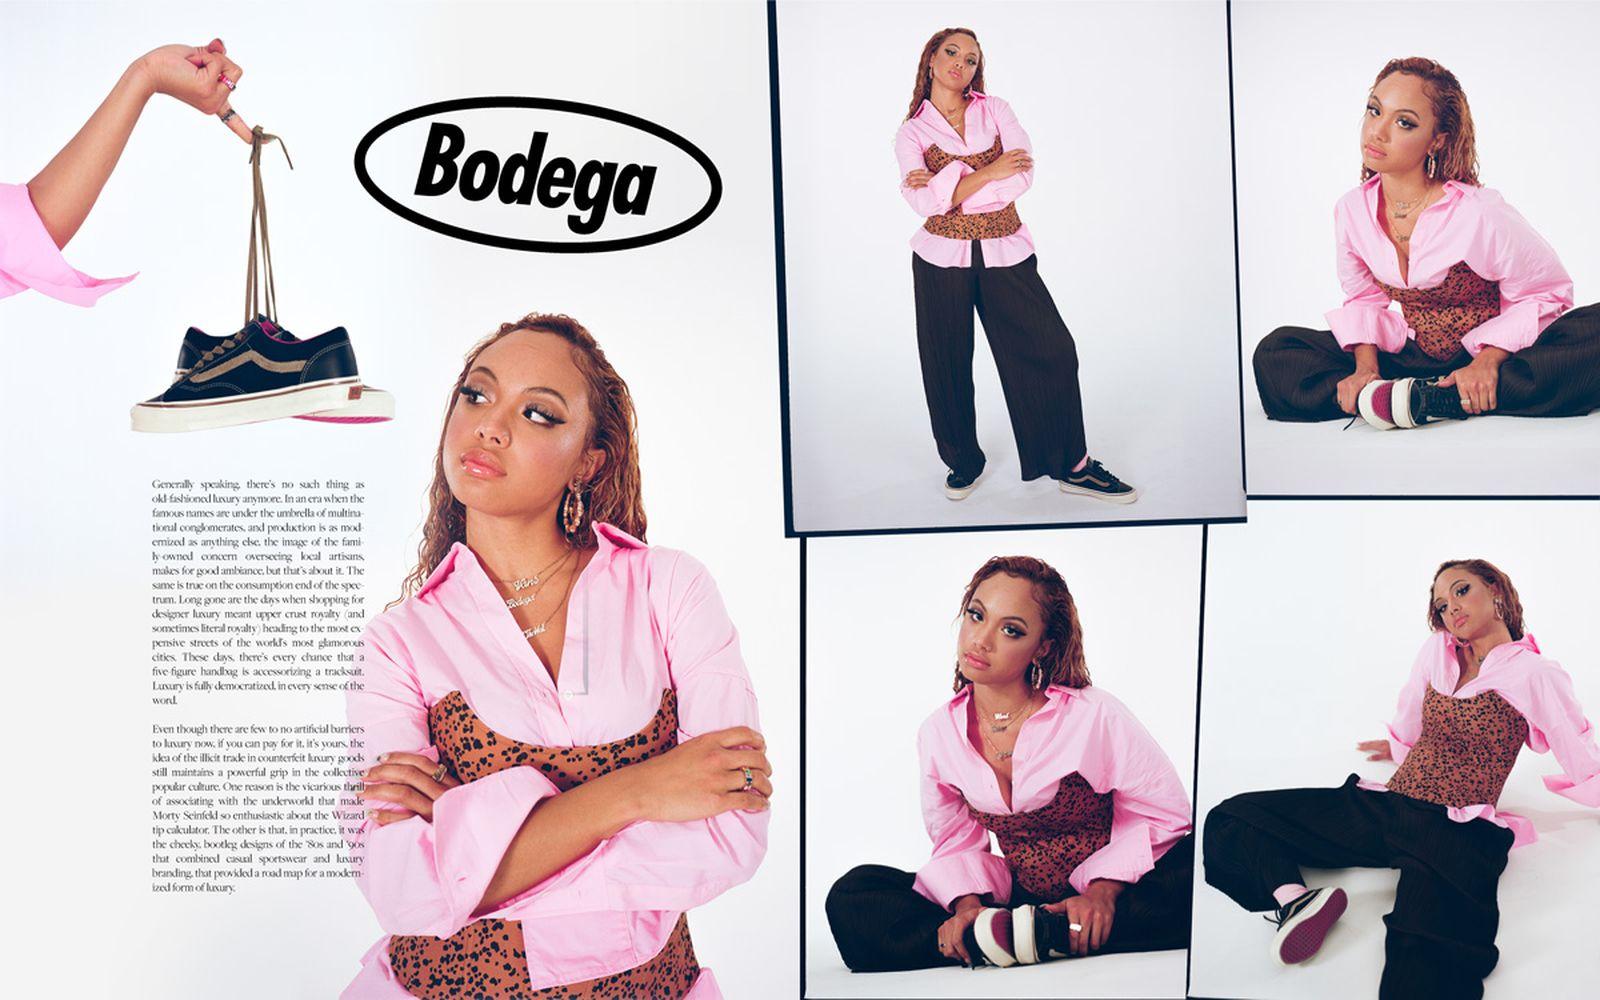 bodega-vault-by-vans-og-style-36-lx-release-date-price-4